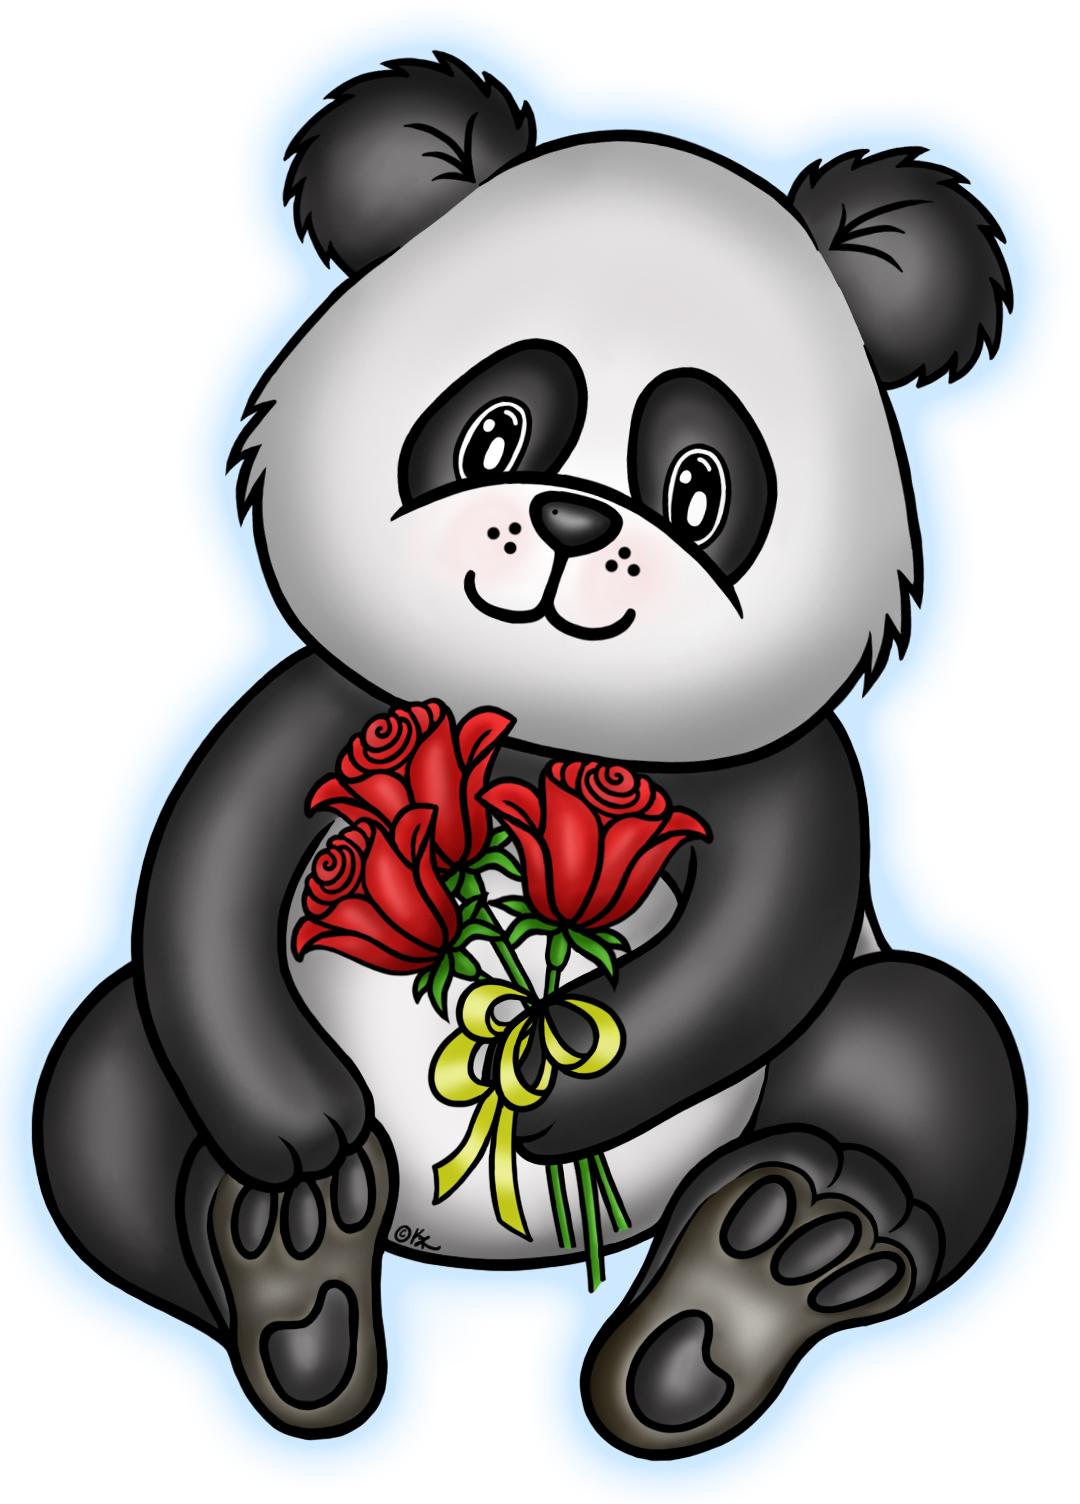 1080x1504 Clip Art Panda Bear Clip Art Images